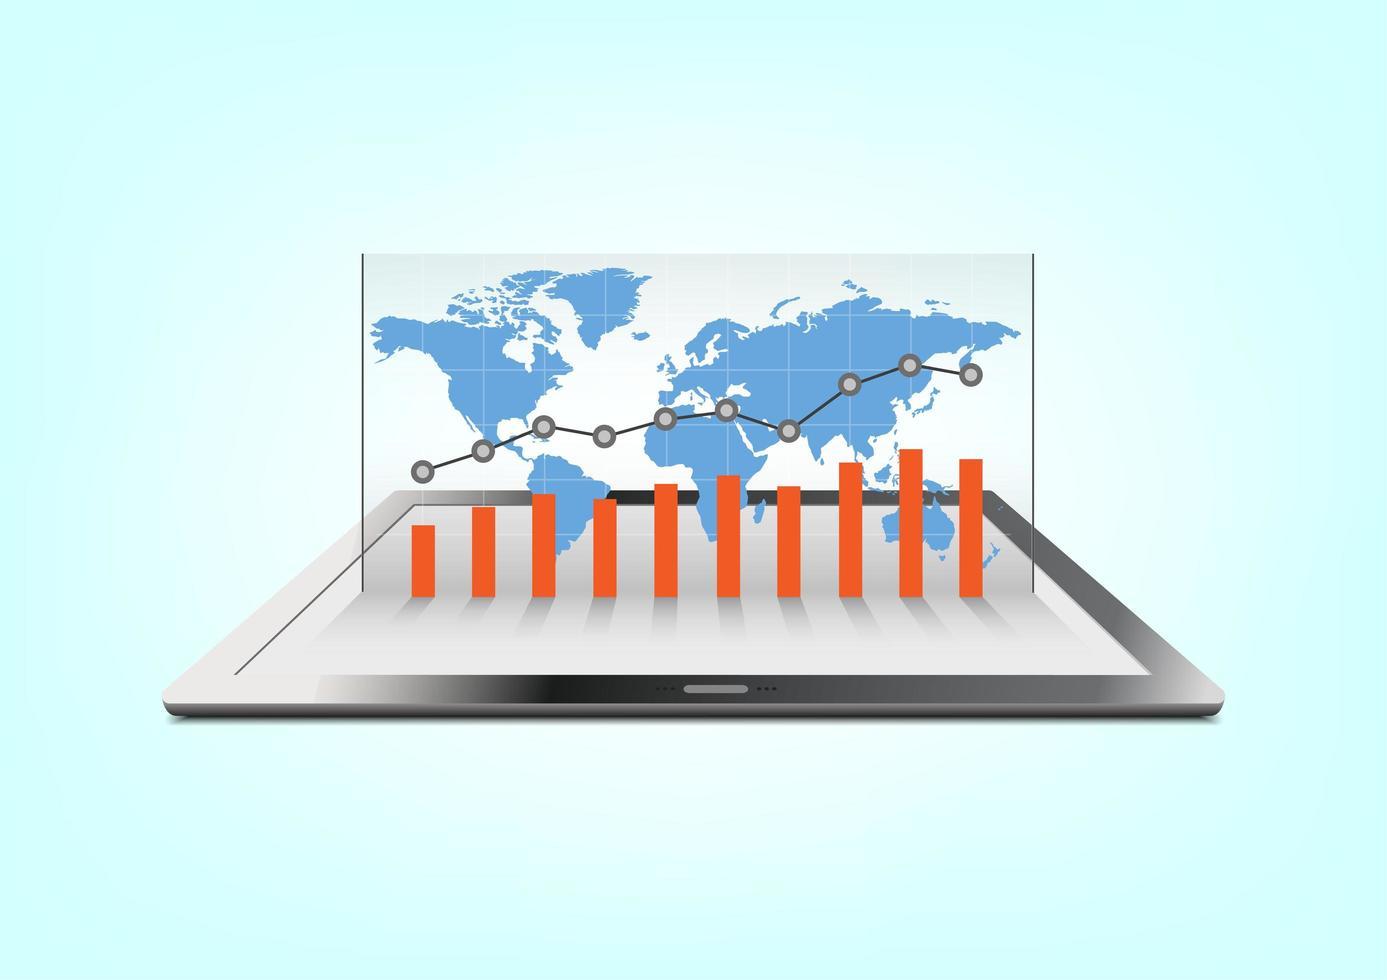 grafico commerciale globale su tablet vettore